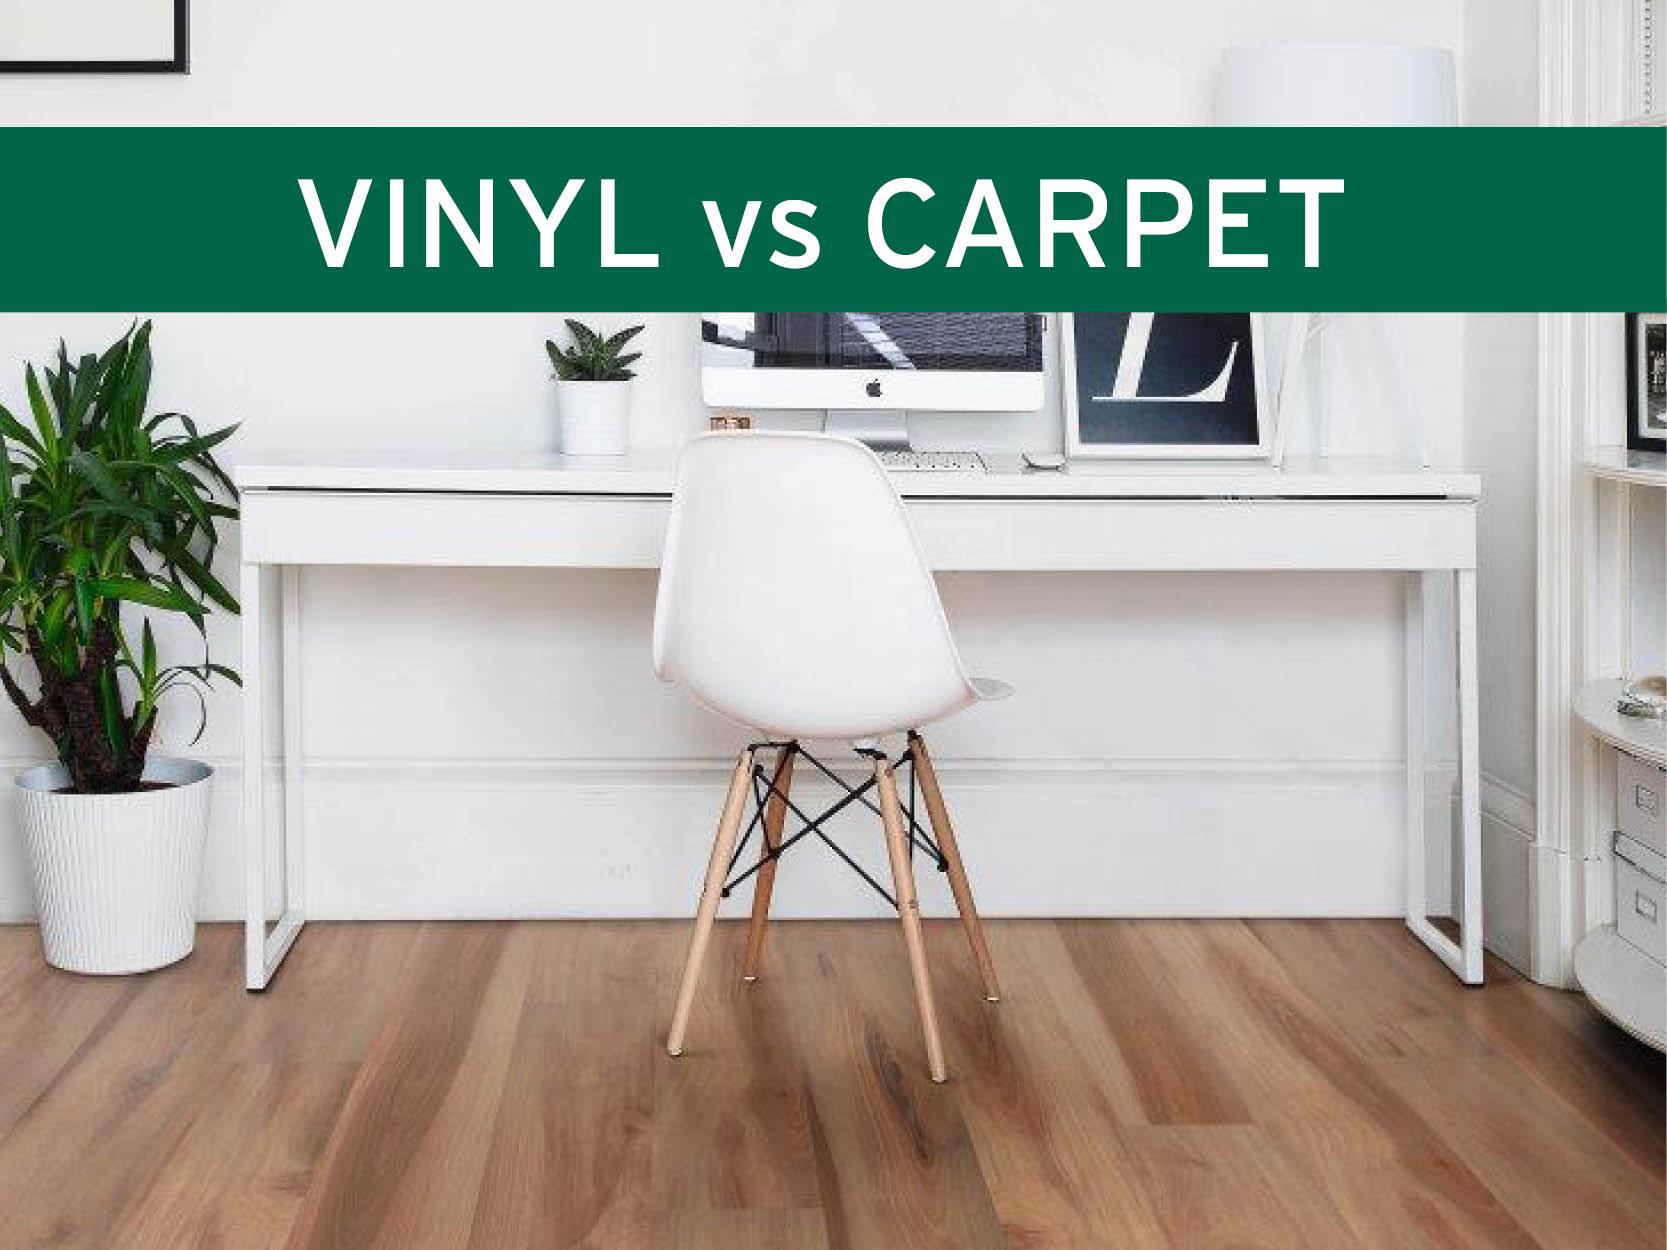 Vinyl vs Carpet